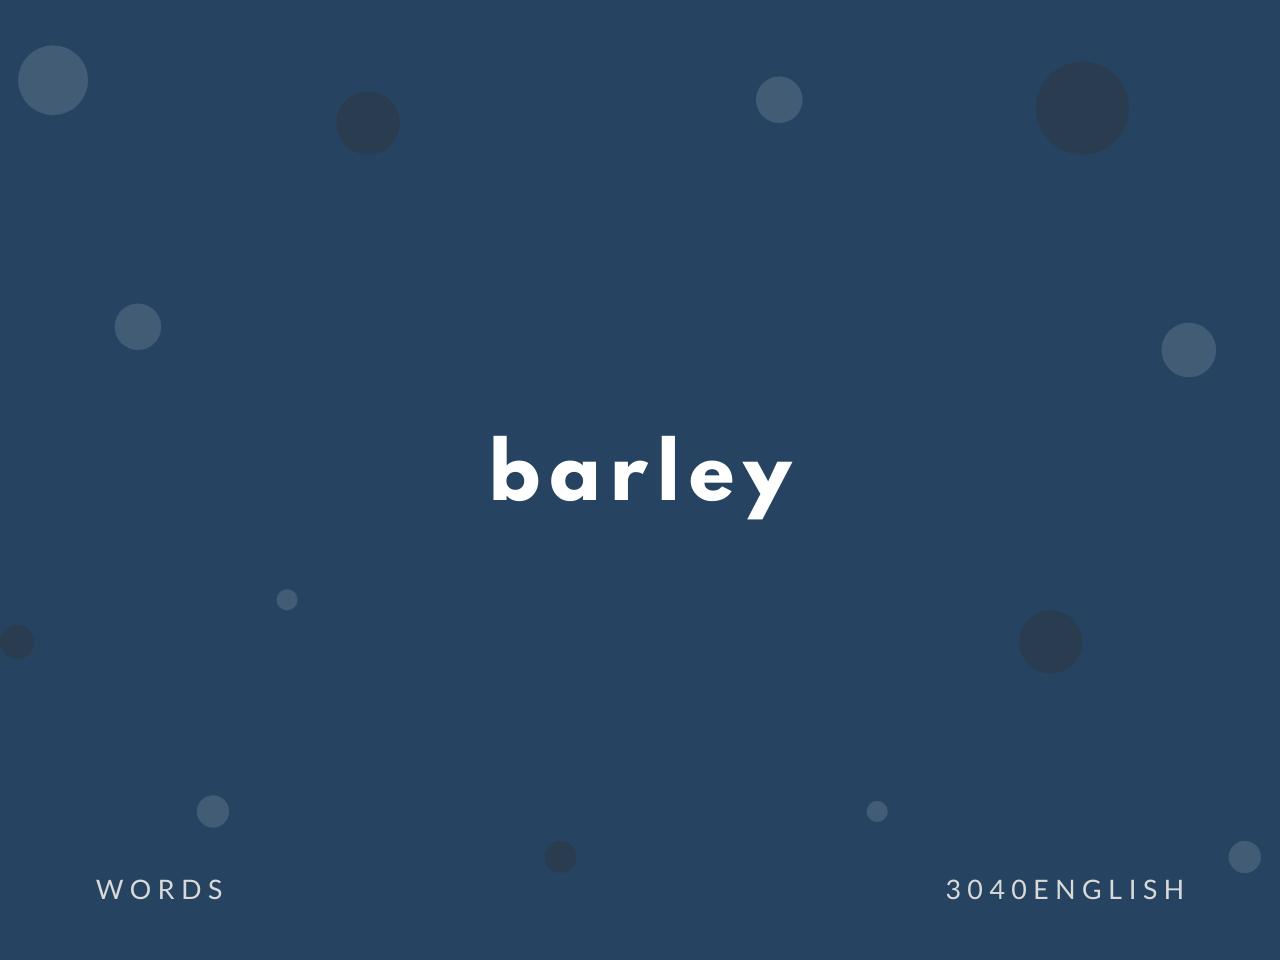 barley の意味と簡単な使い方【音読用例文あり】